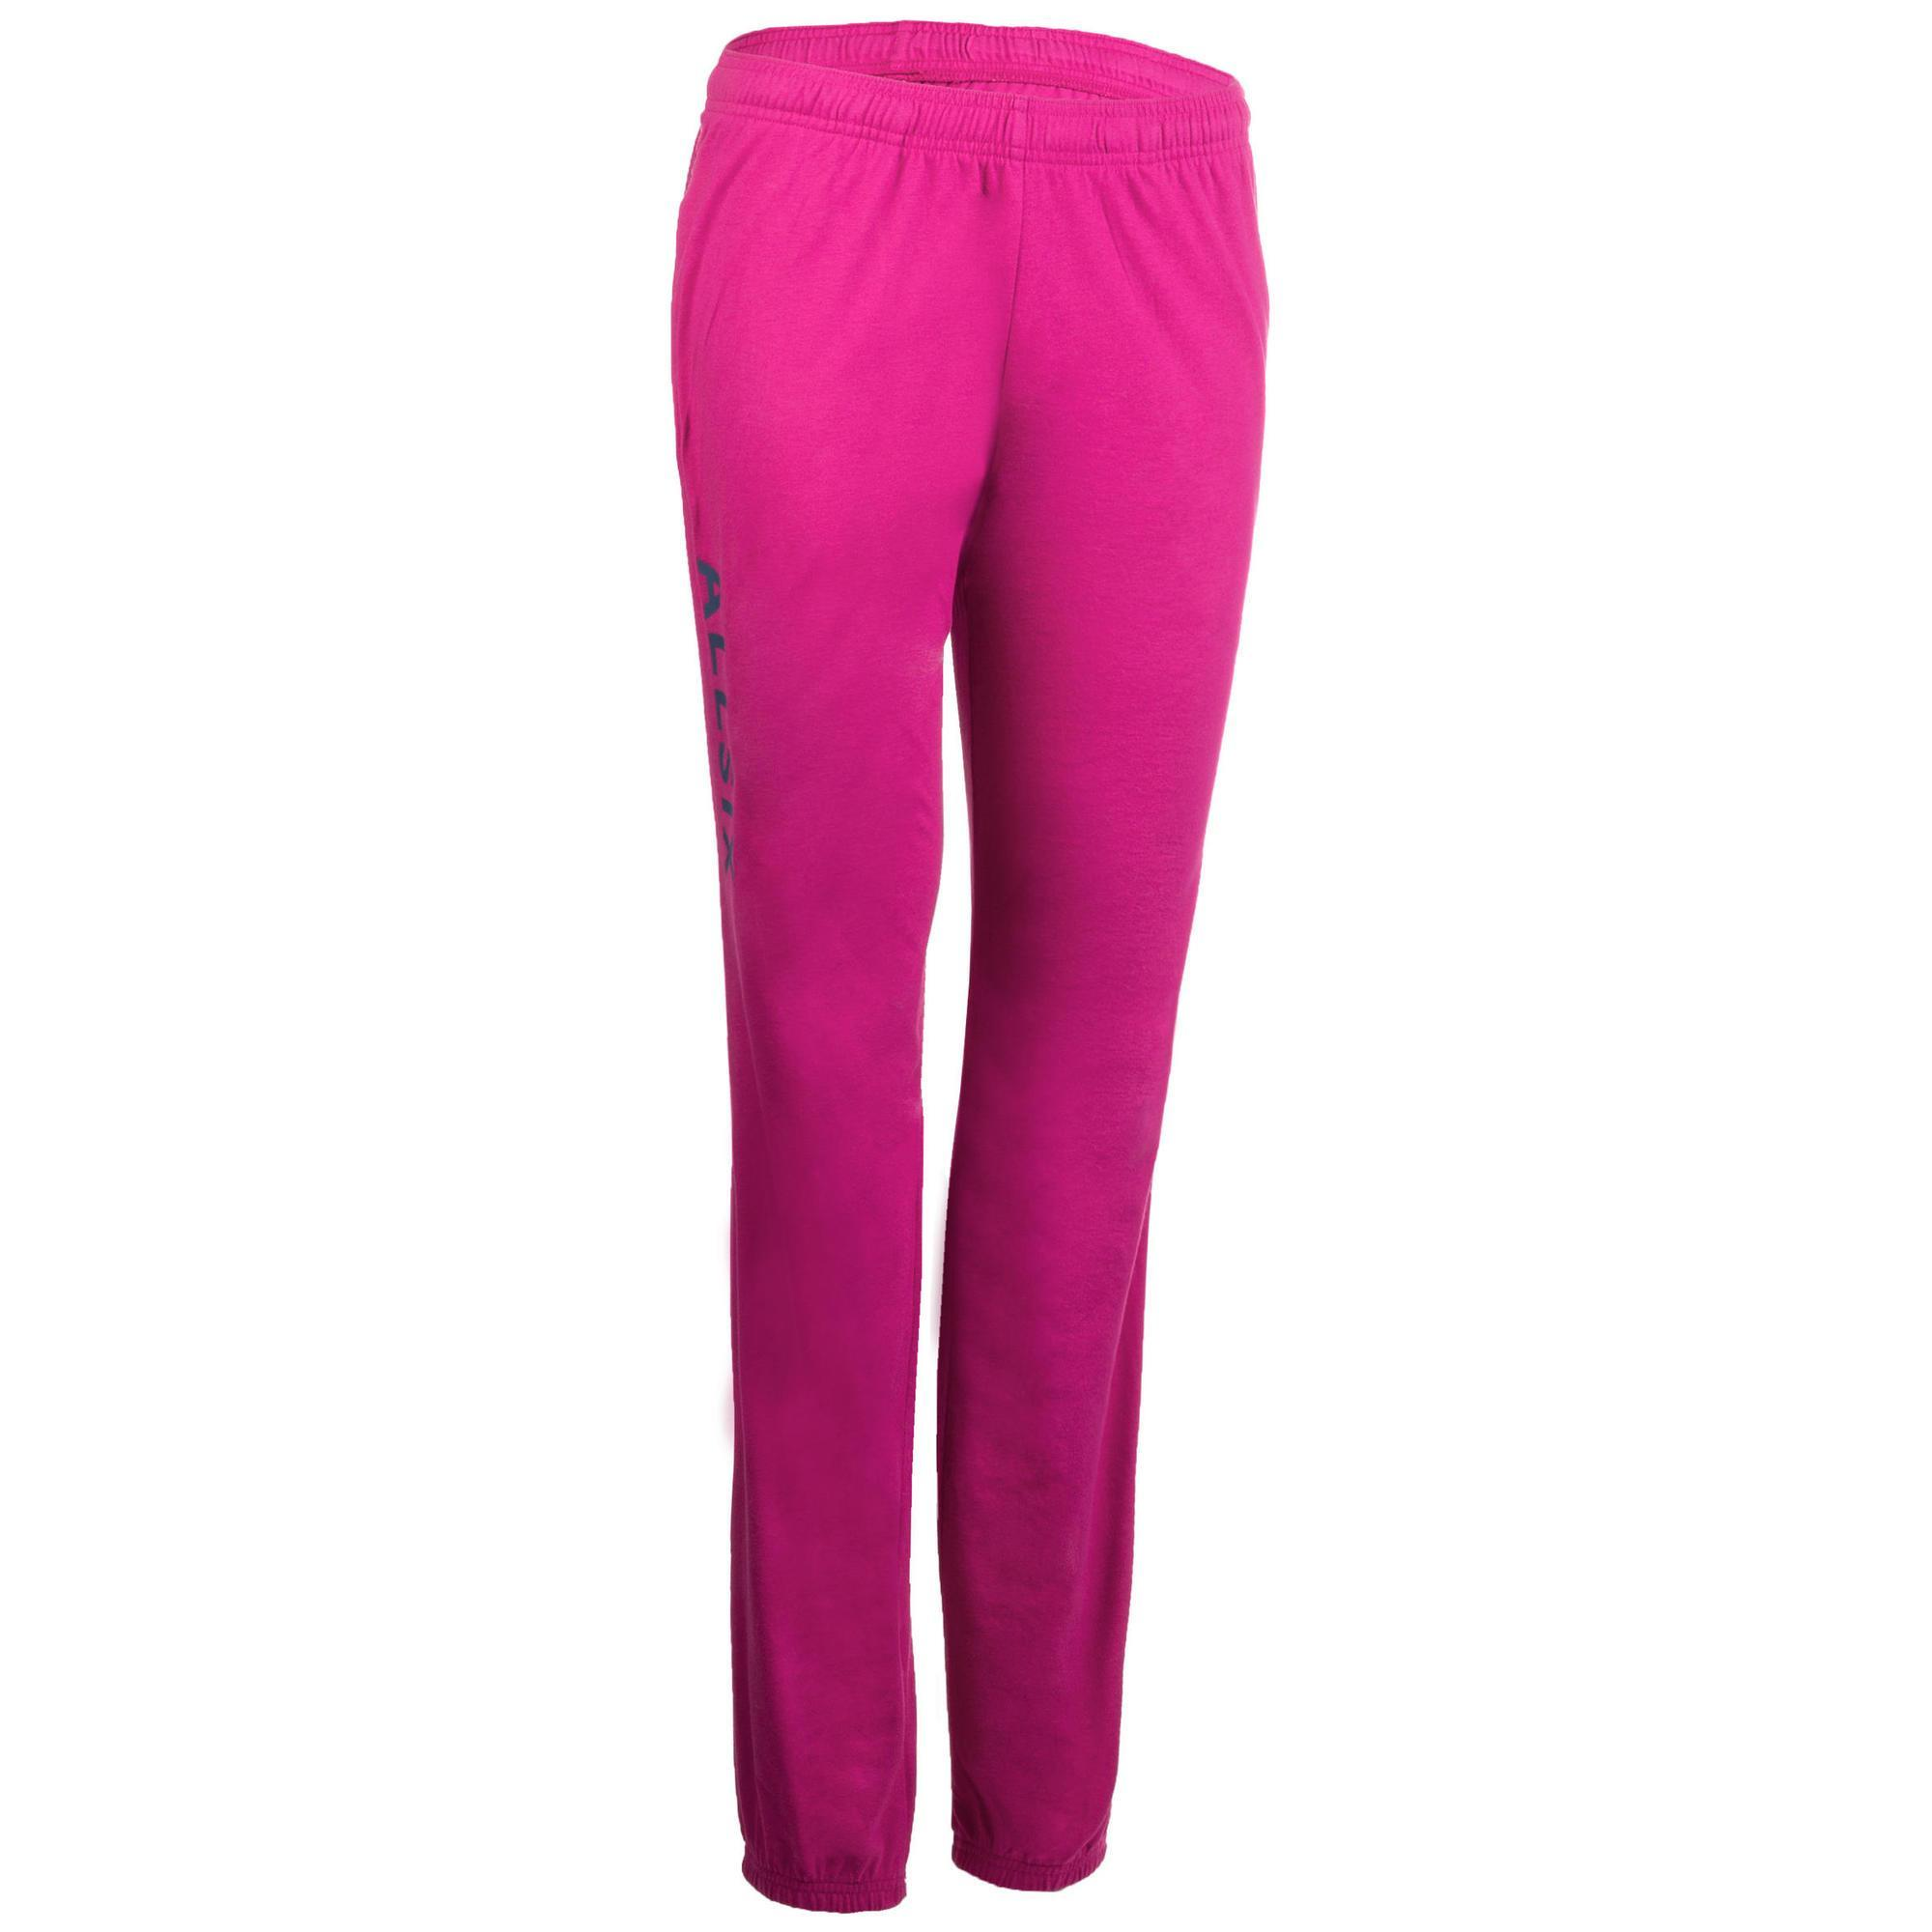 Pantalon de volley ball v100 femme rose allsix